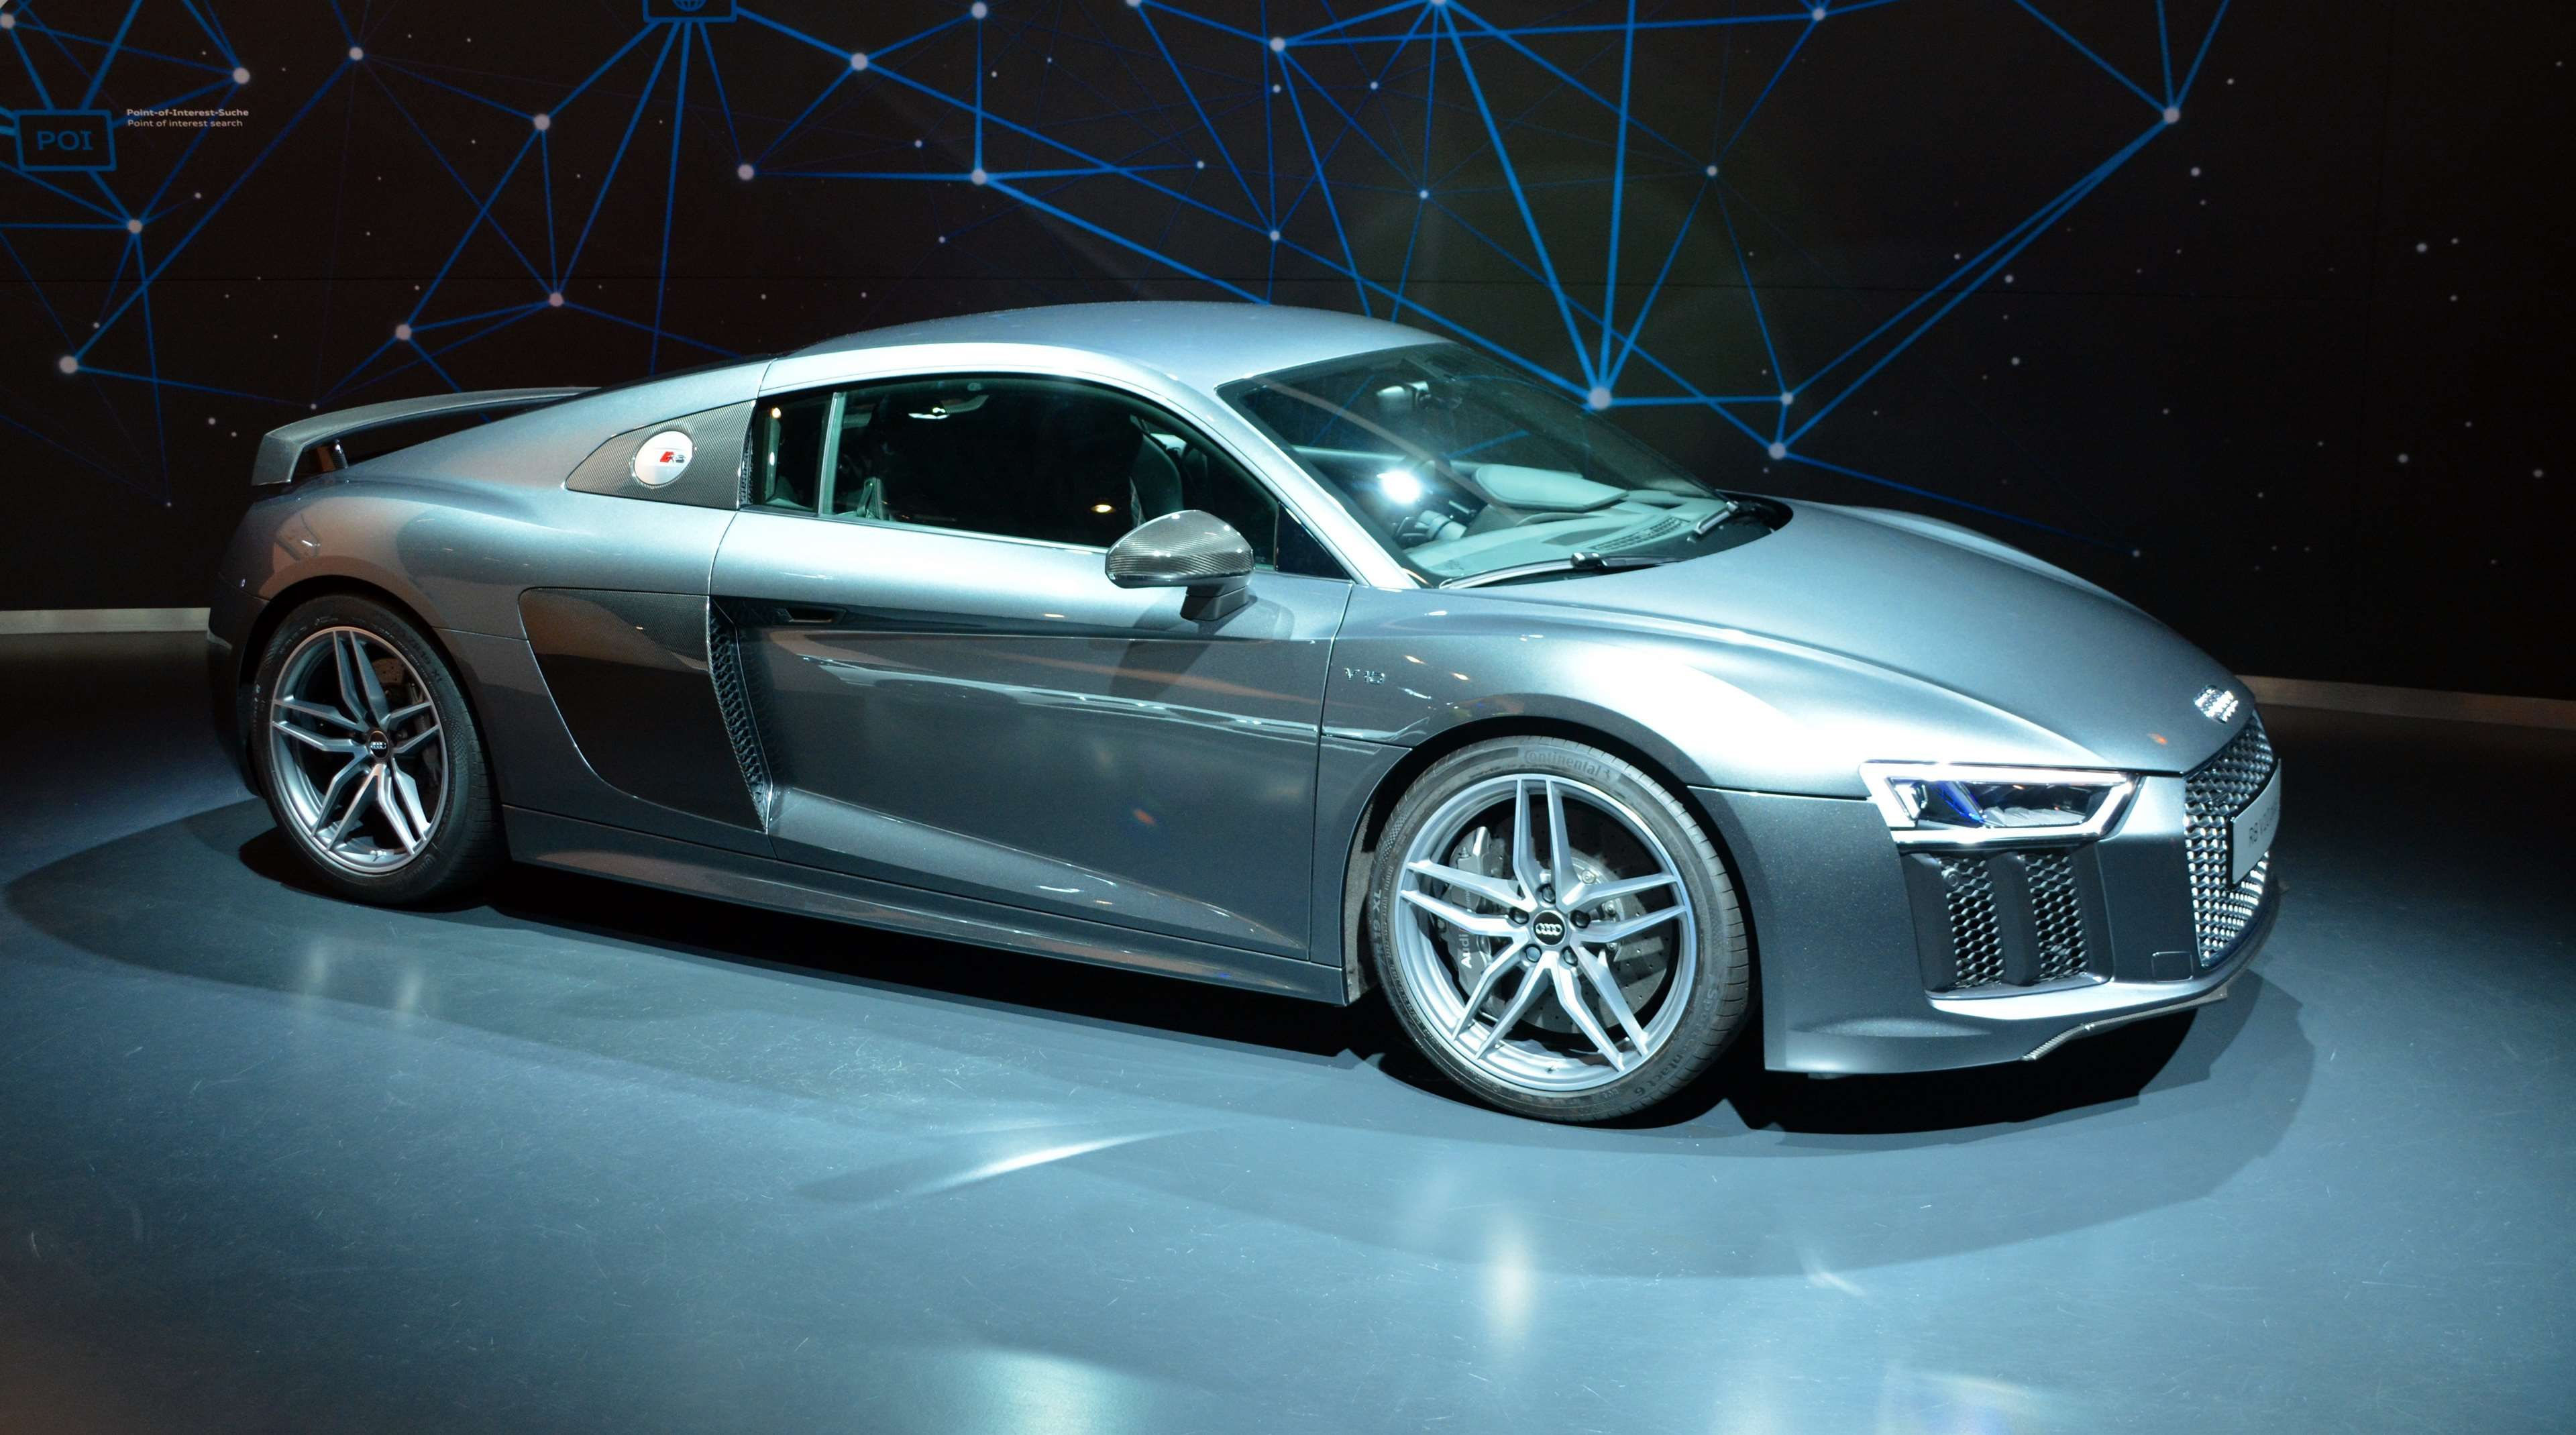 2017 Audi R8 2017 AUDI R8 (V10) CHARCOAL GRAY / BLACK S1524   Car Home Idea    Pinterest   Audi R8 V10, R8 V10 And Cars